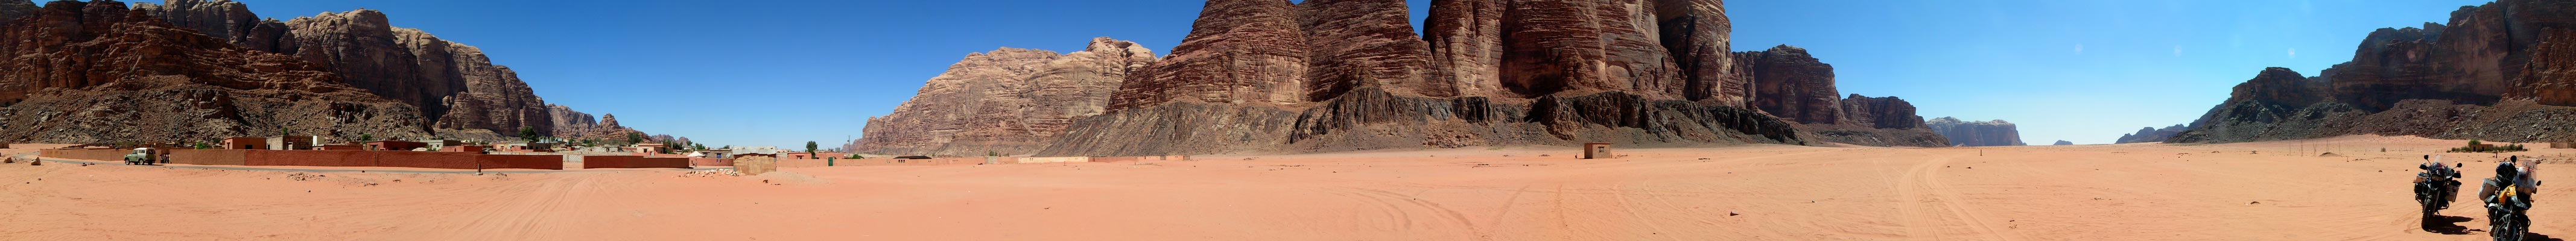 Panoráma Wadi Rum